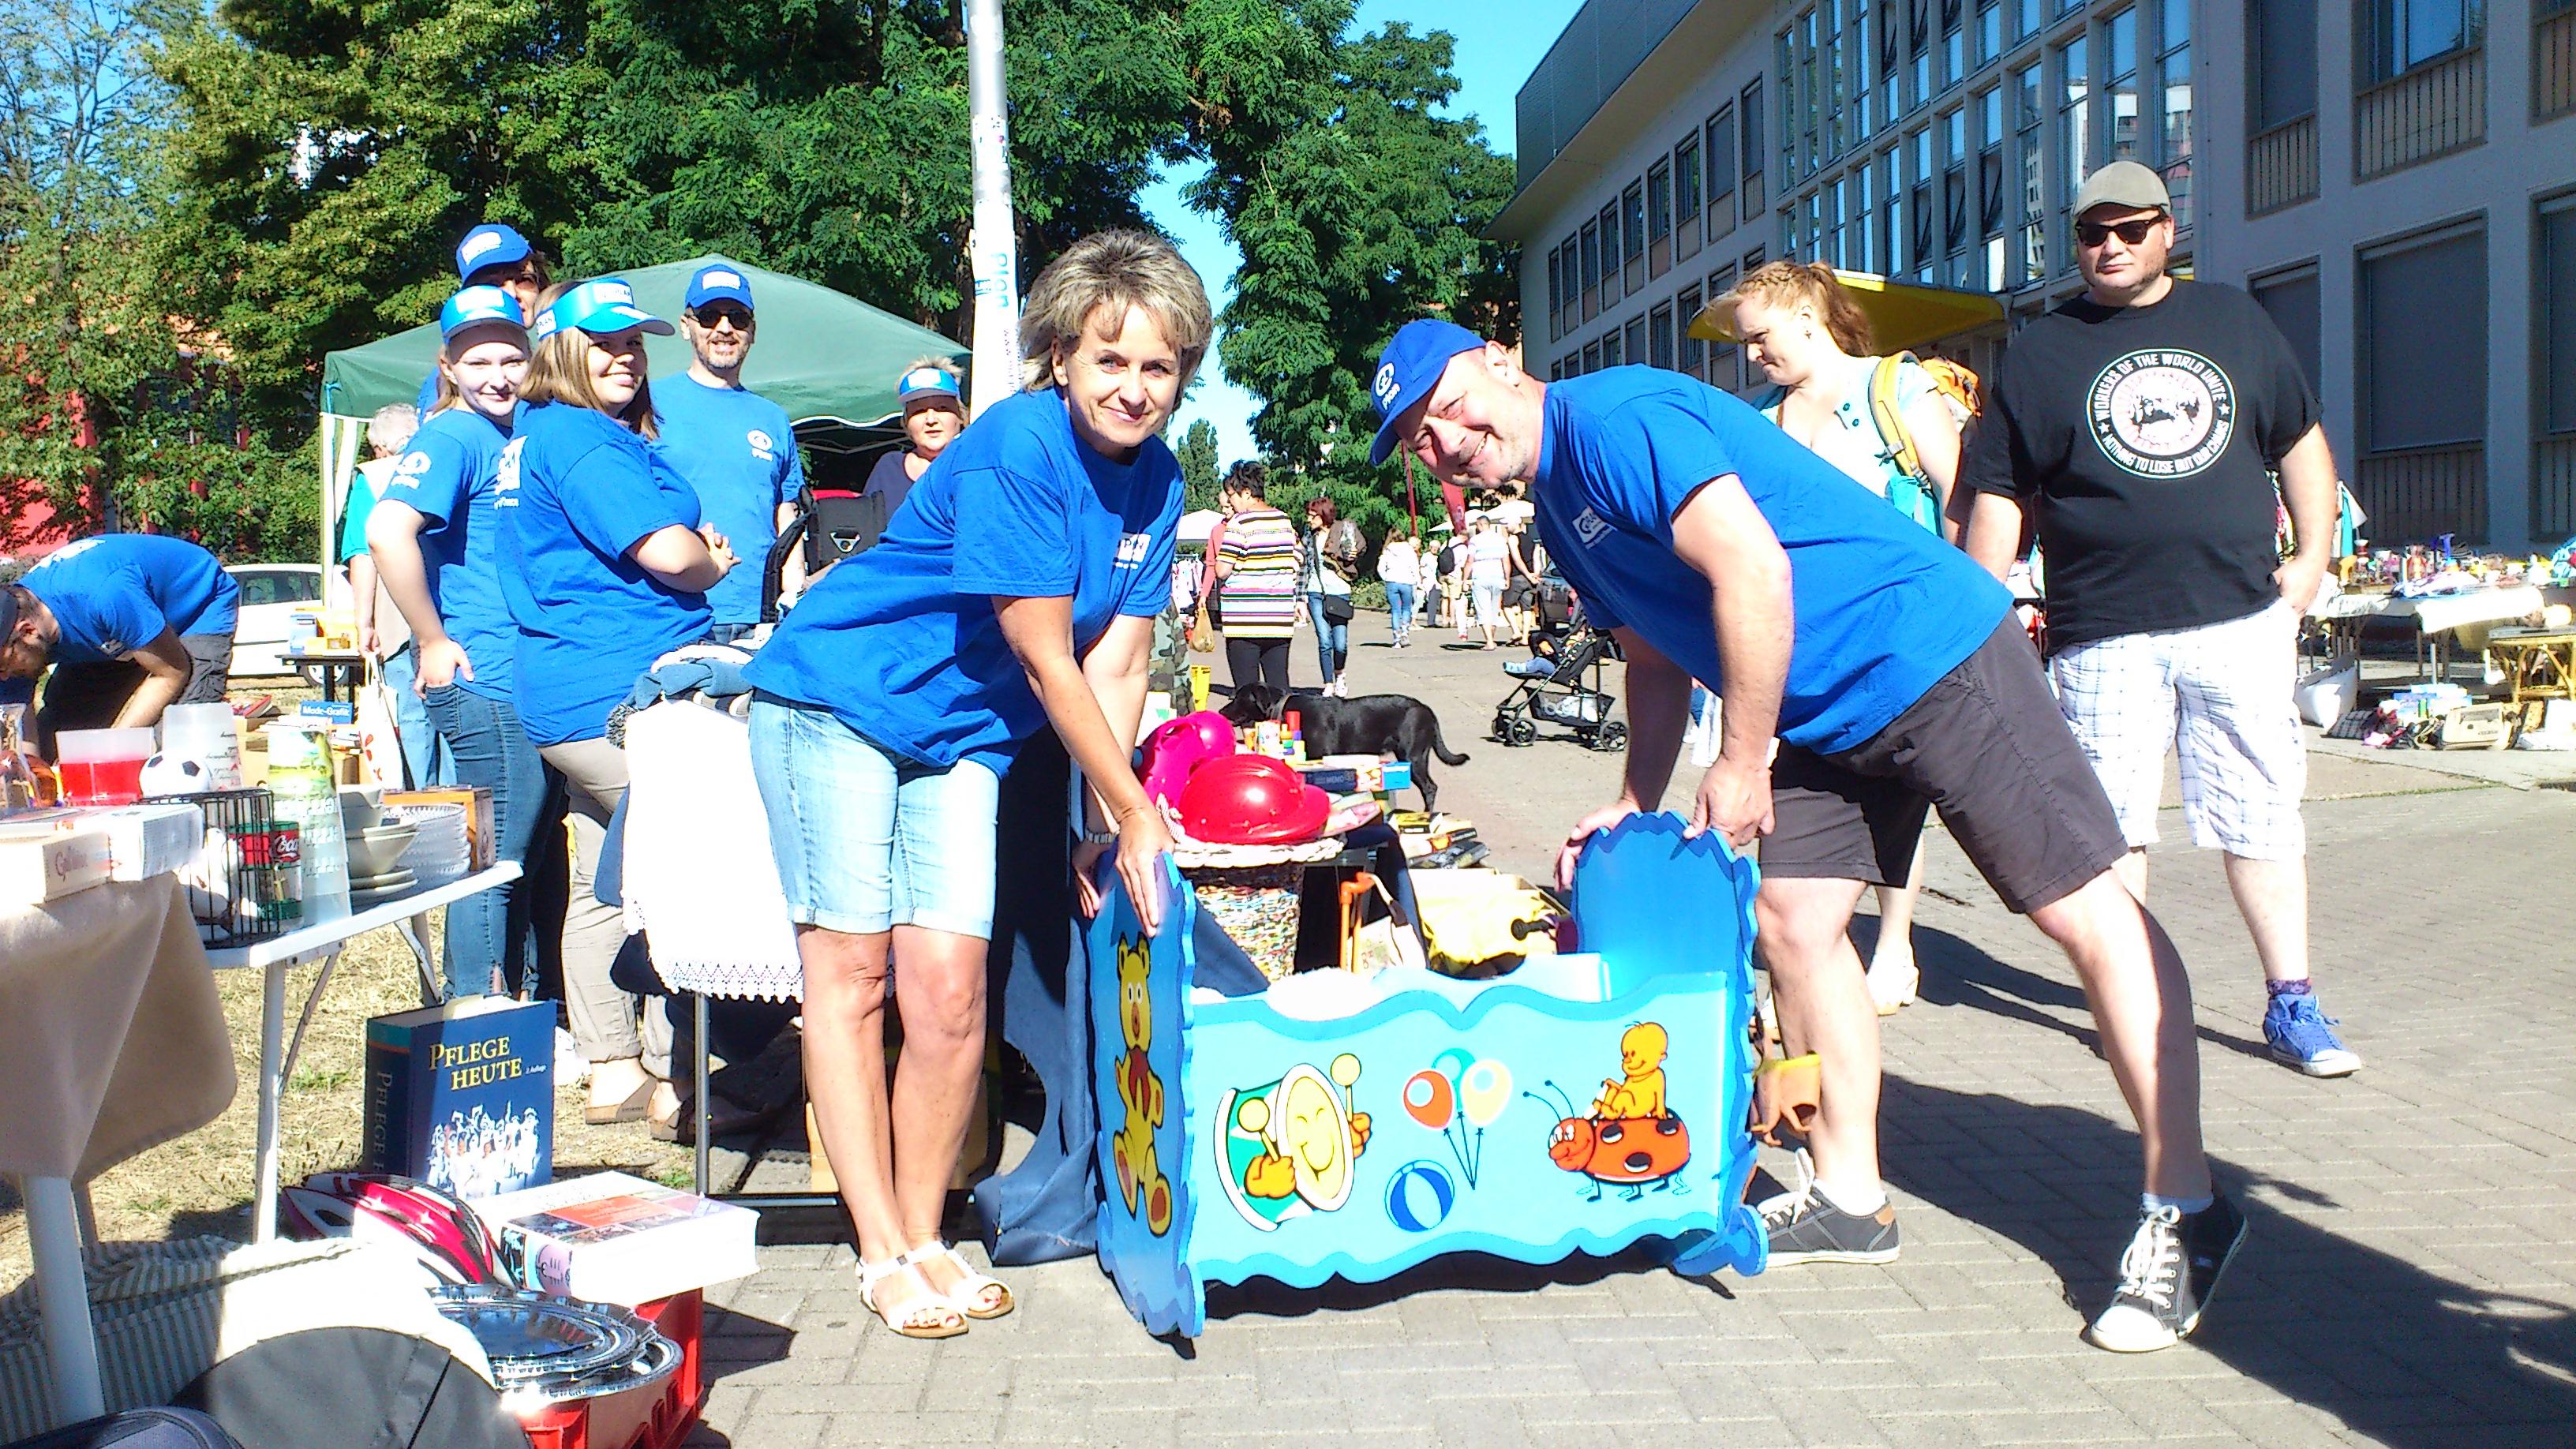 Flohmarkt am 7. Juli